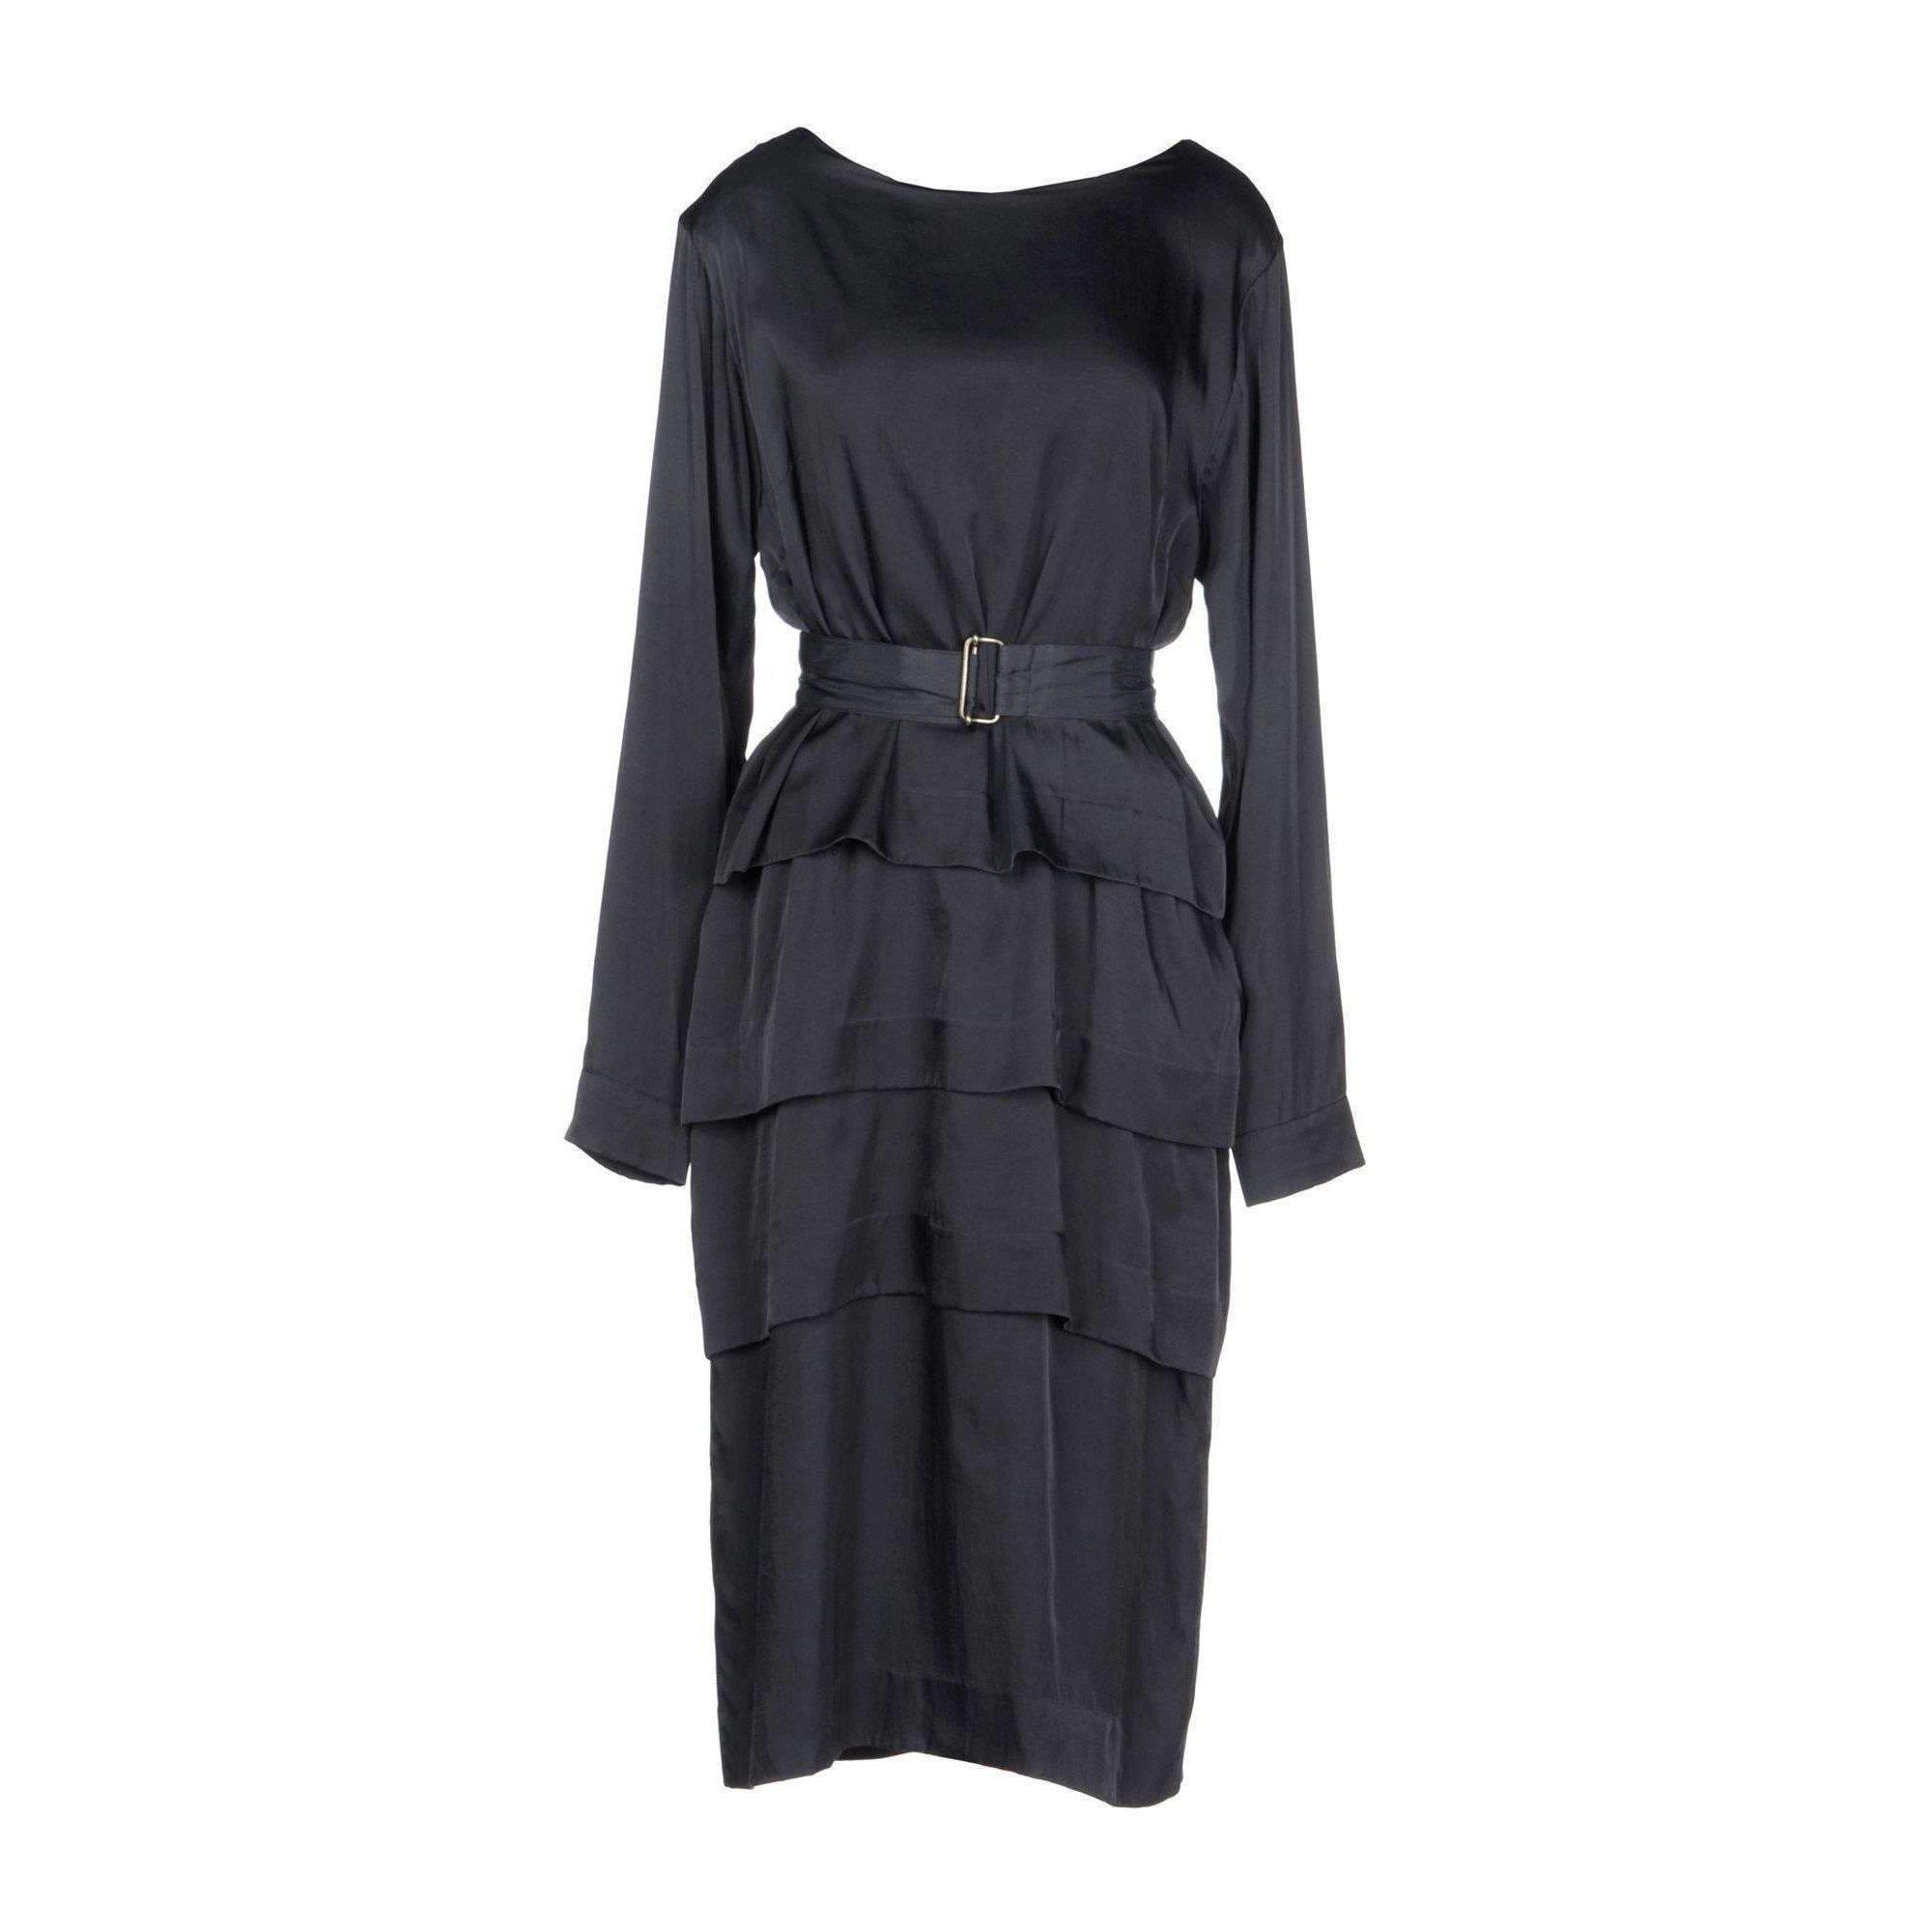 01d71bd3d2 Dries Van Noten Dole 5116 W.w.navy Layered Dress in Blue - Lyst